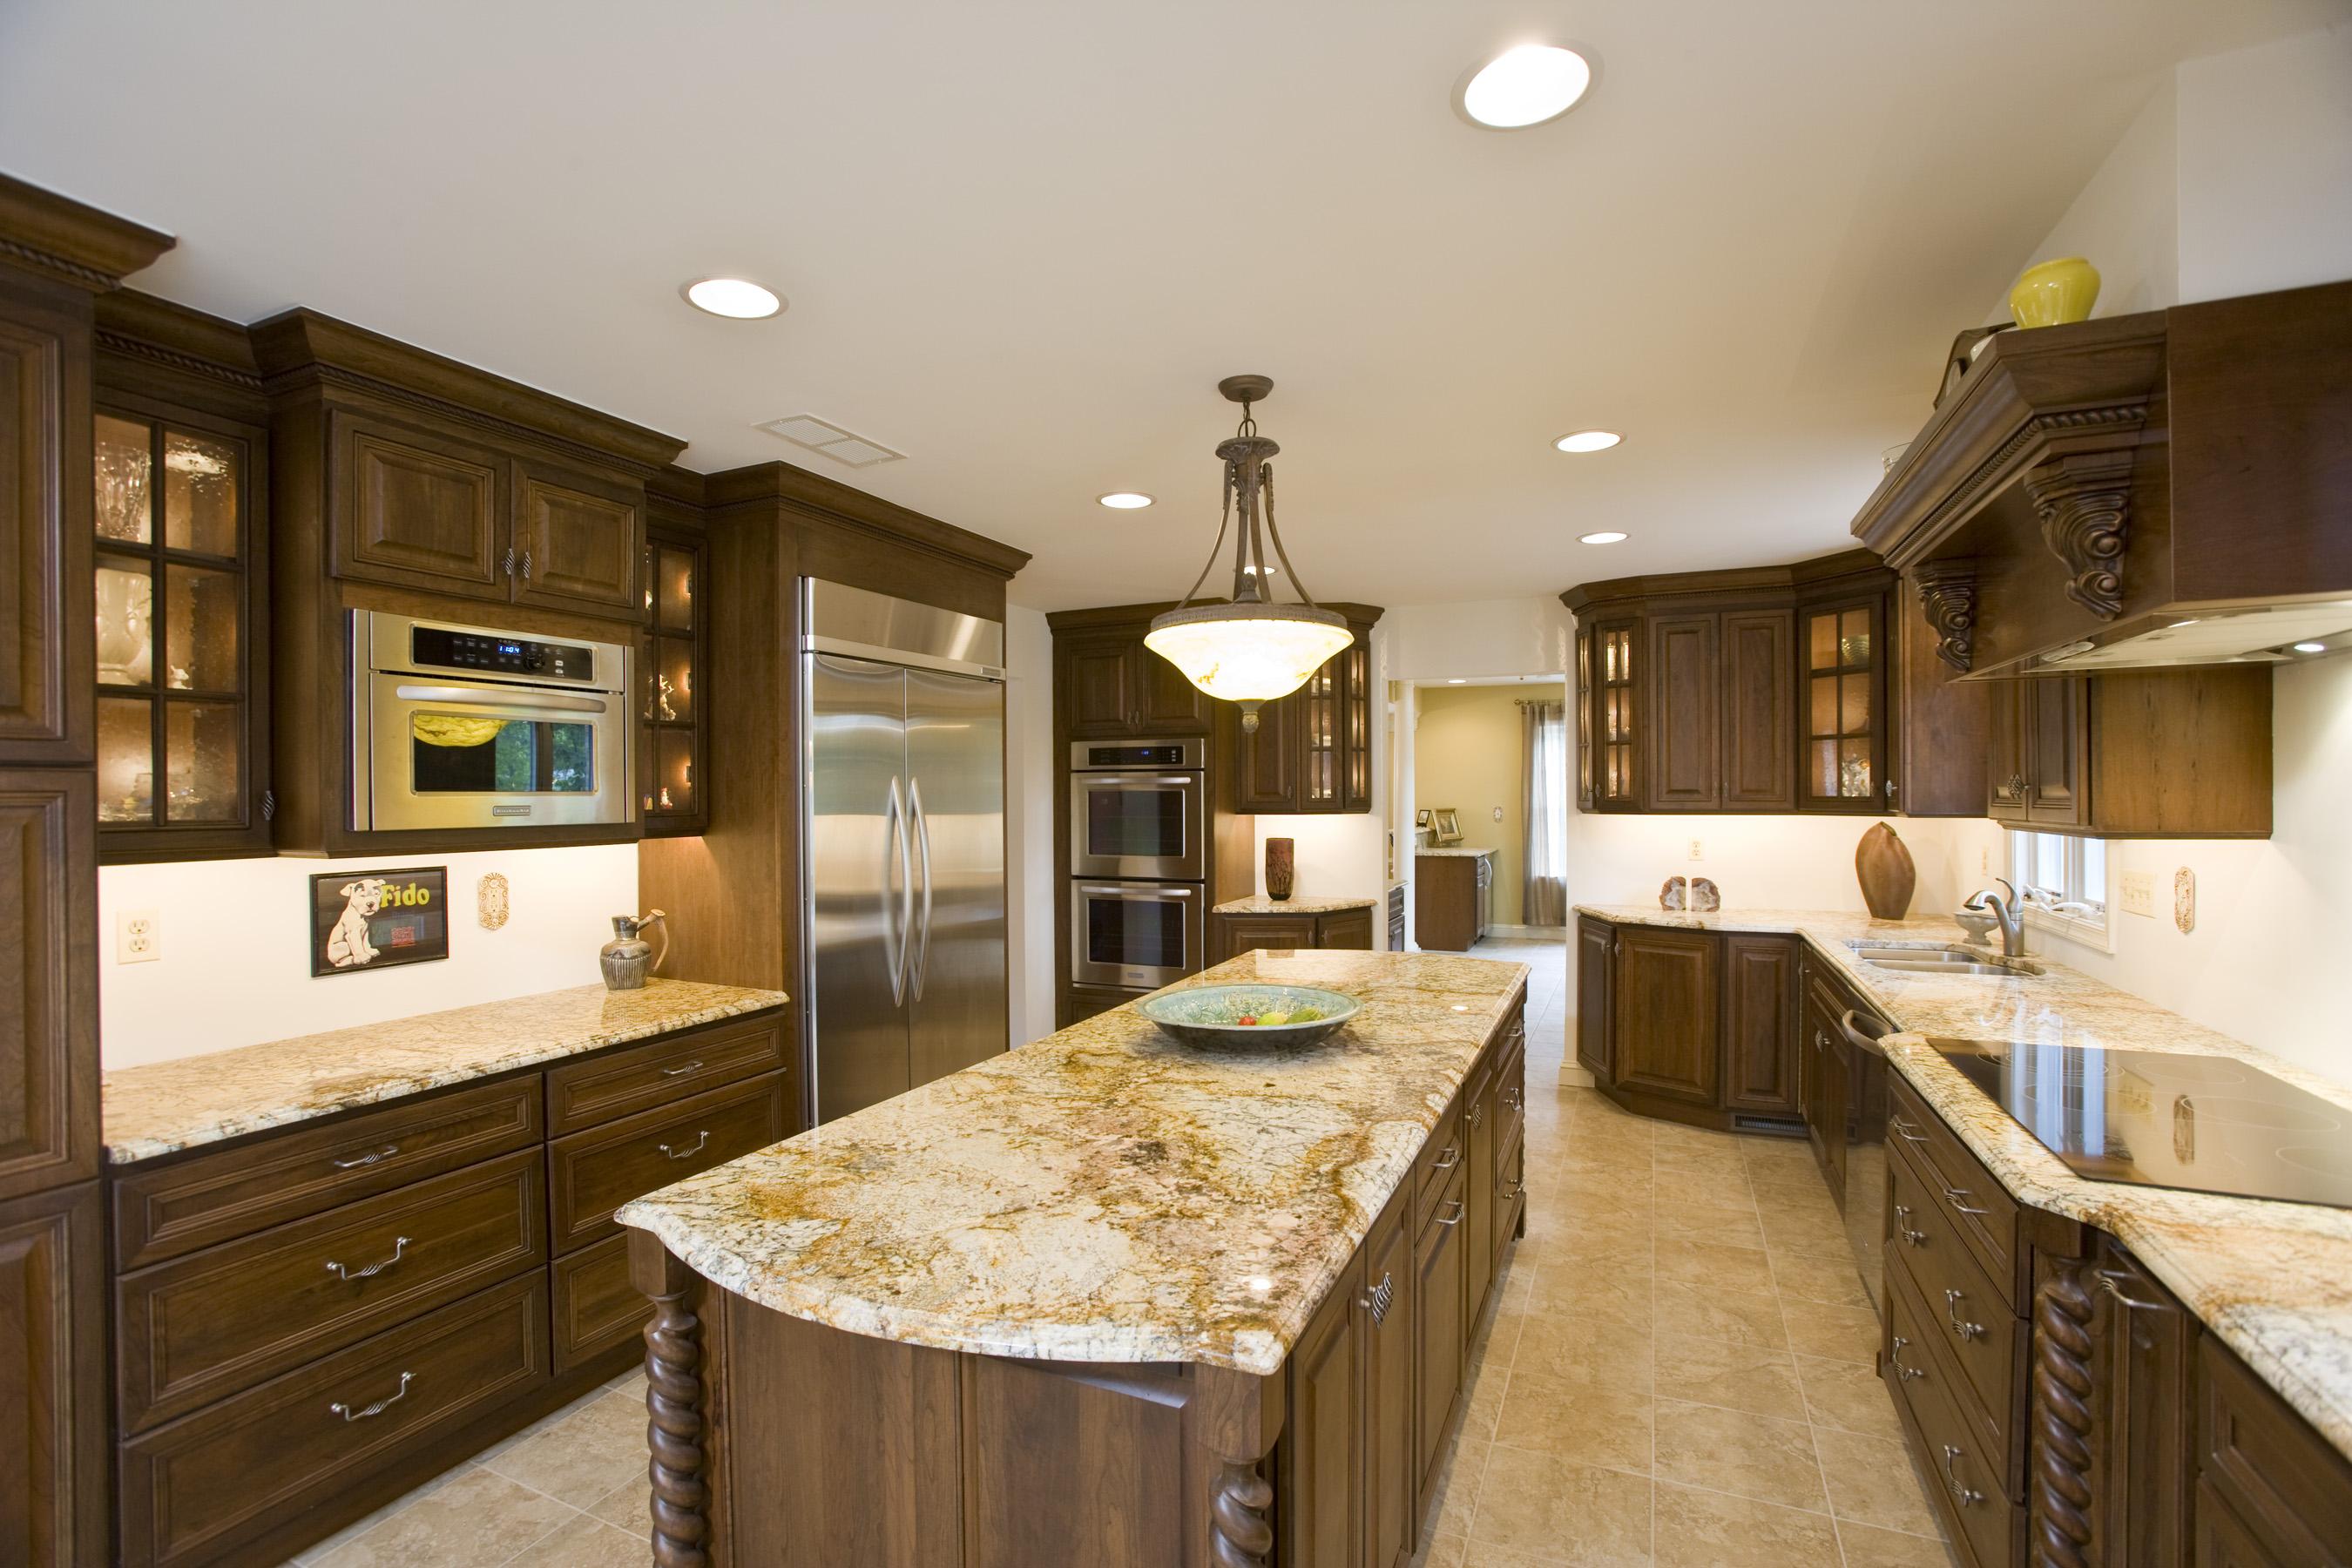 granite kitchen counter pictures photo - 3